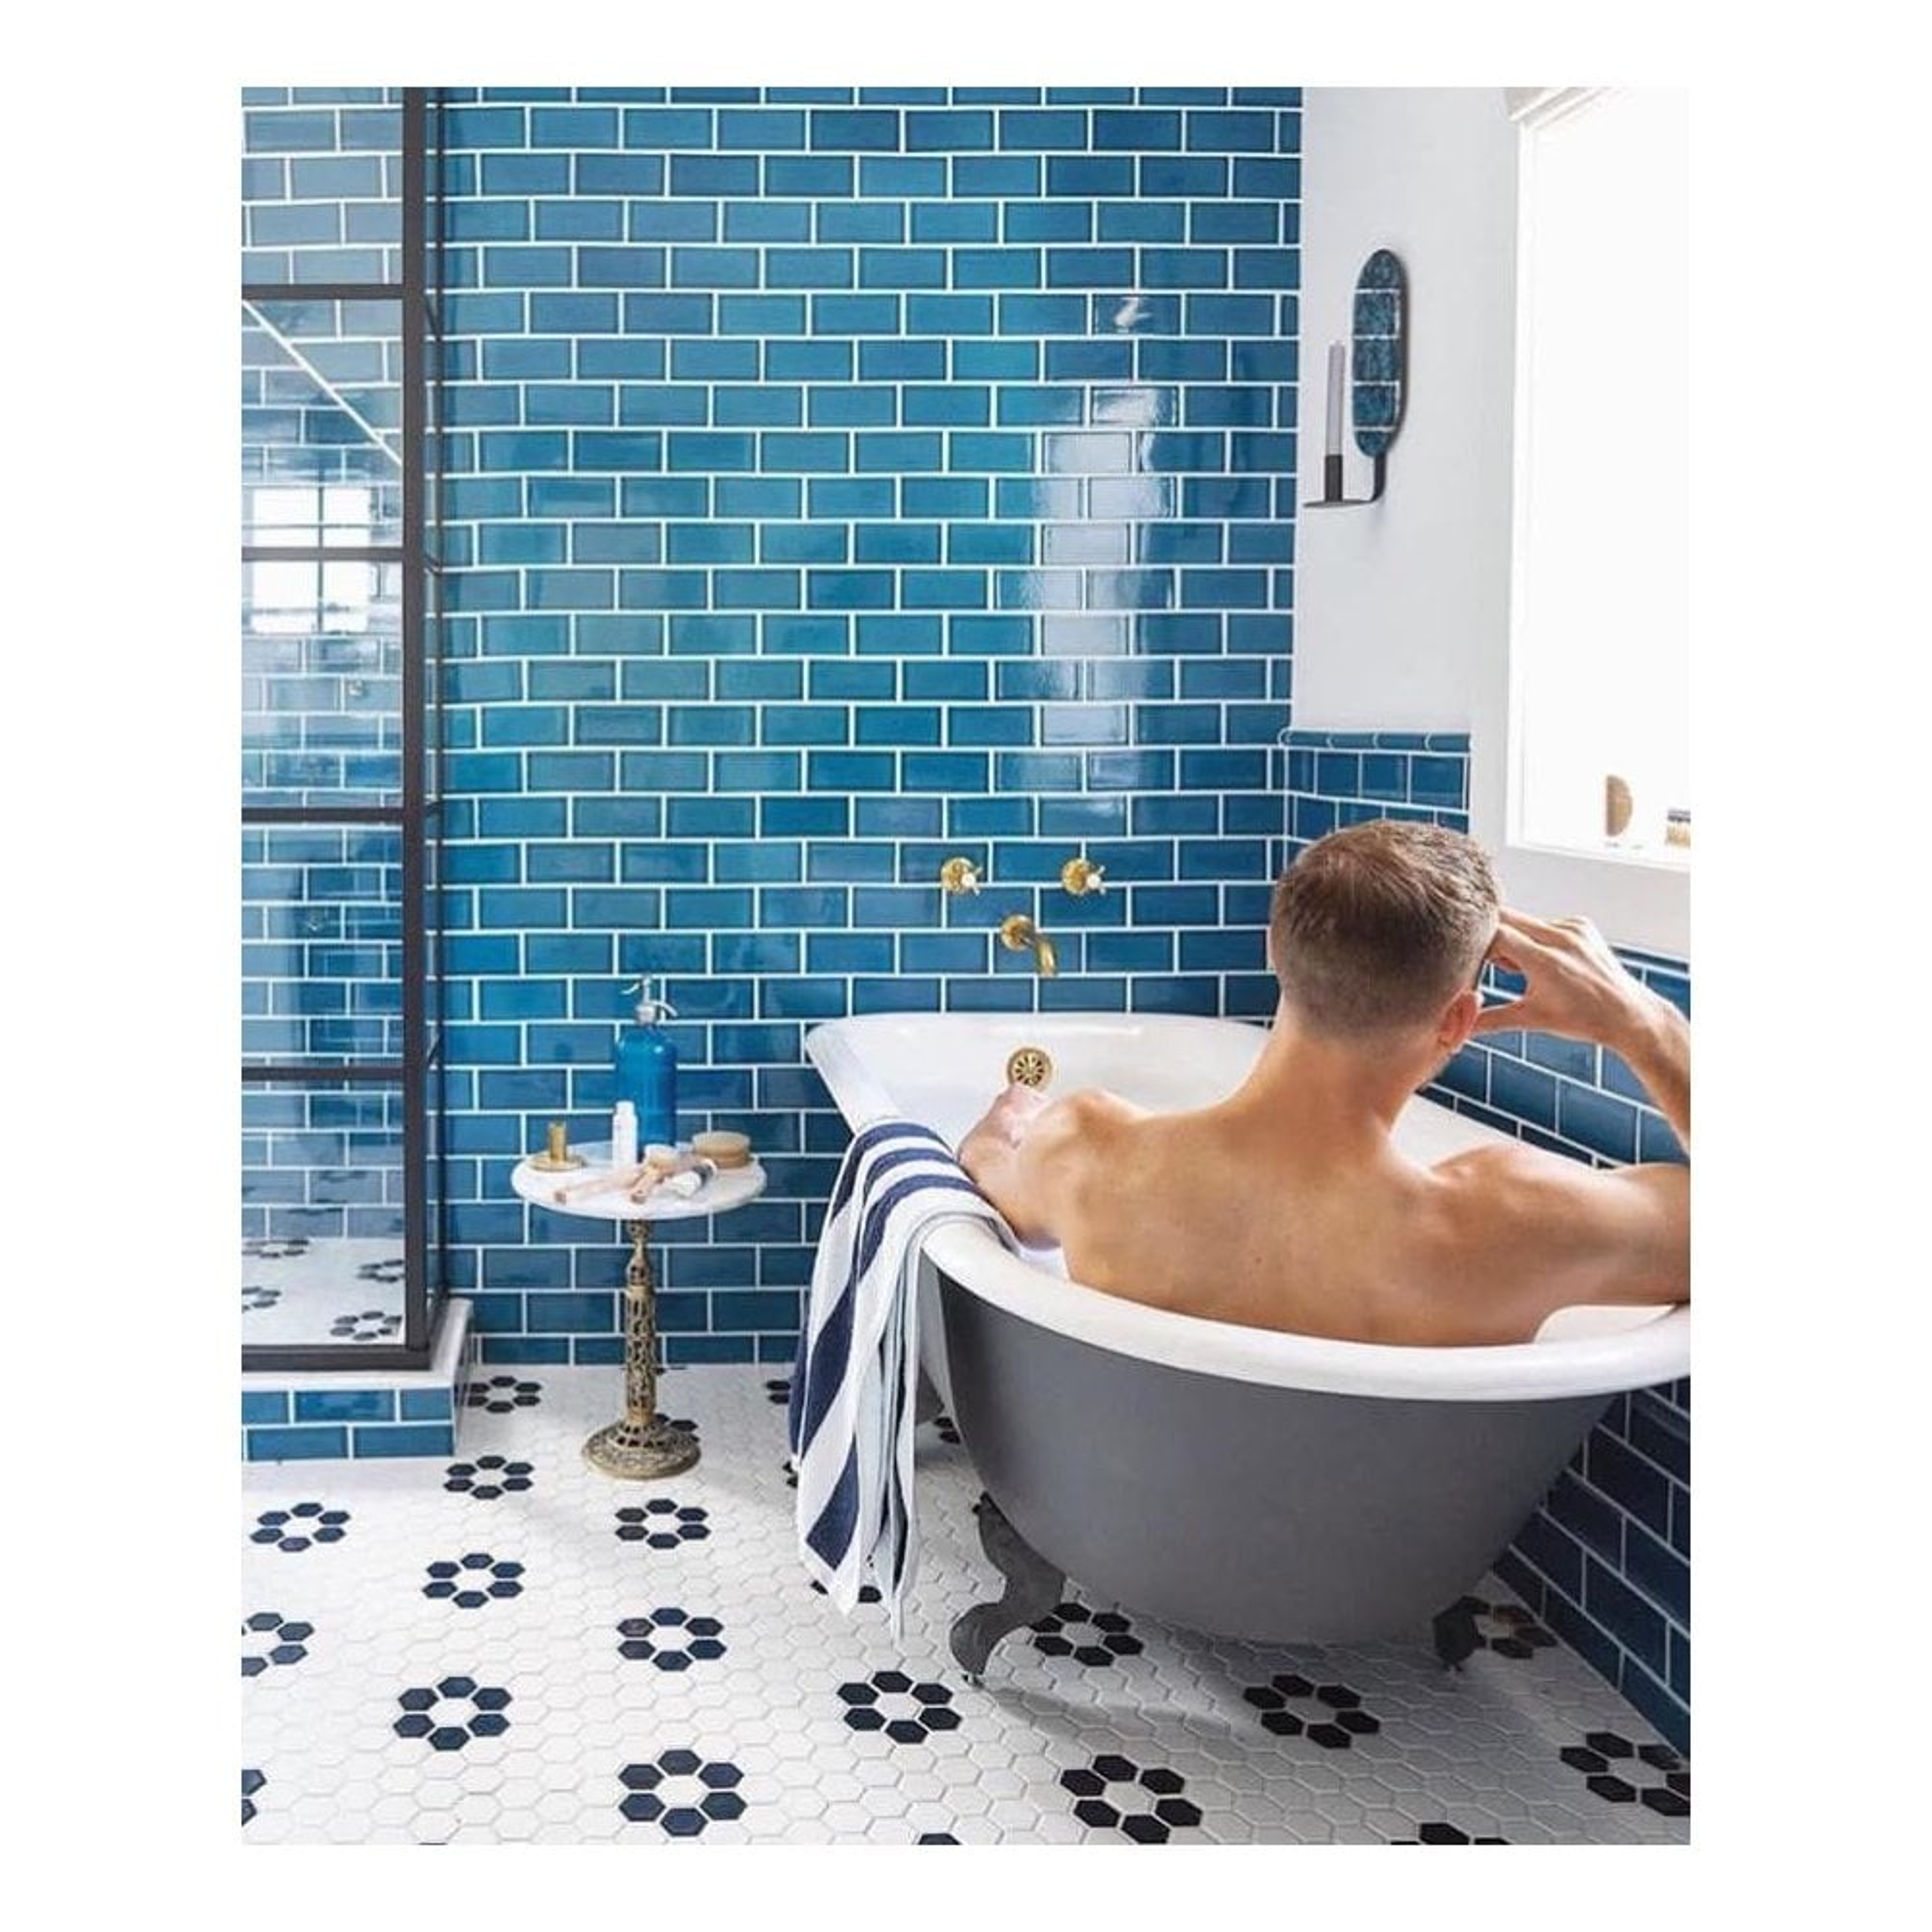 Glazed Bathroom Tile - Image of Bathroom and Closet